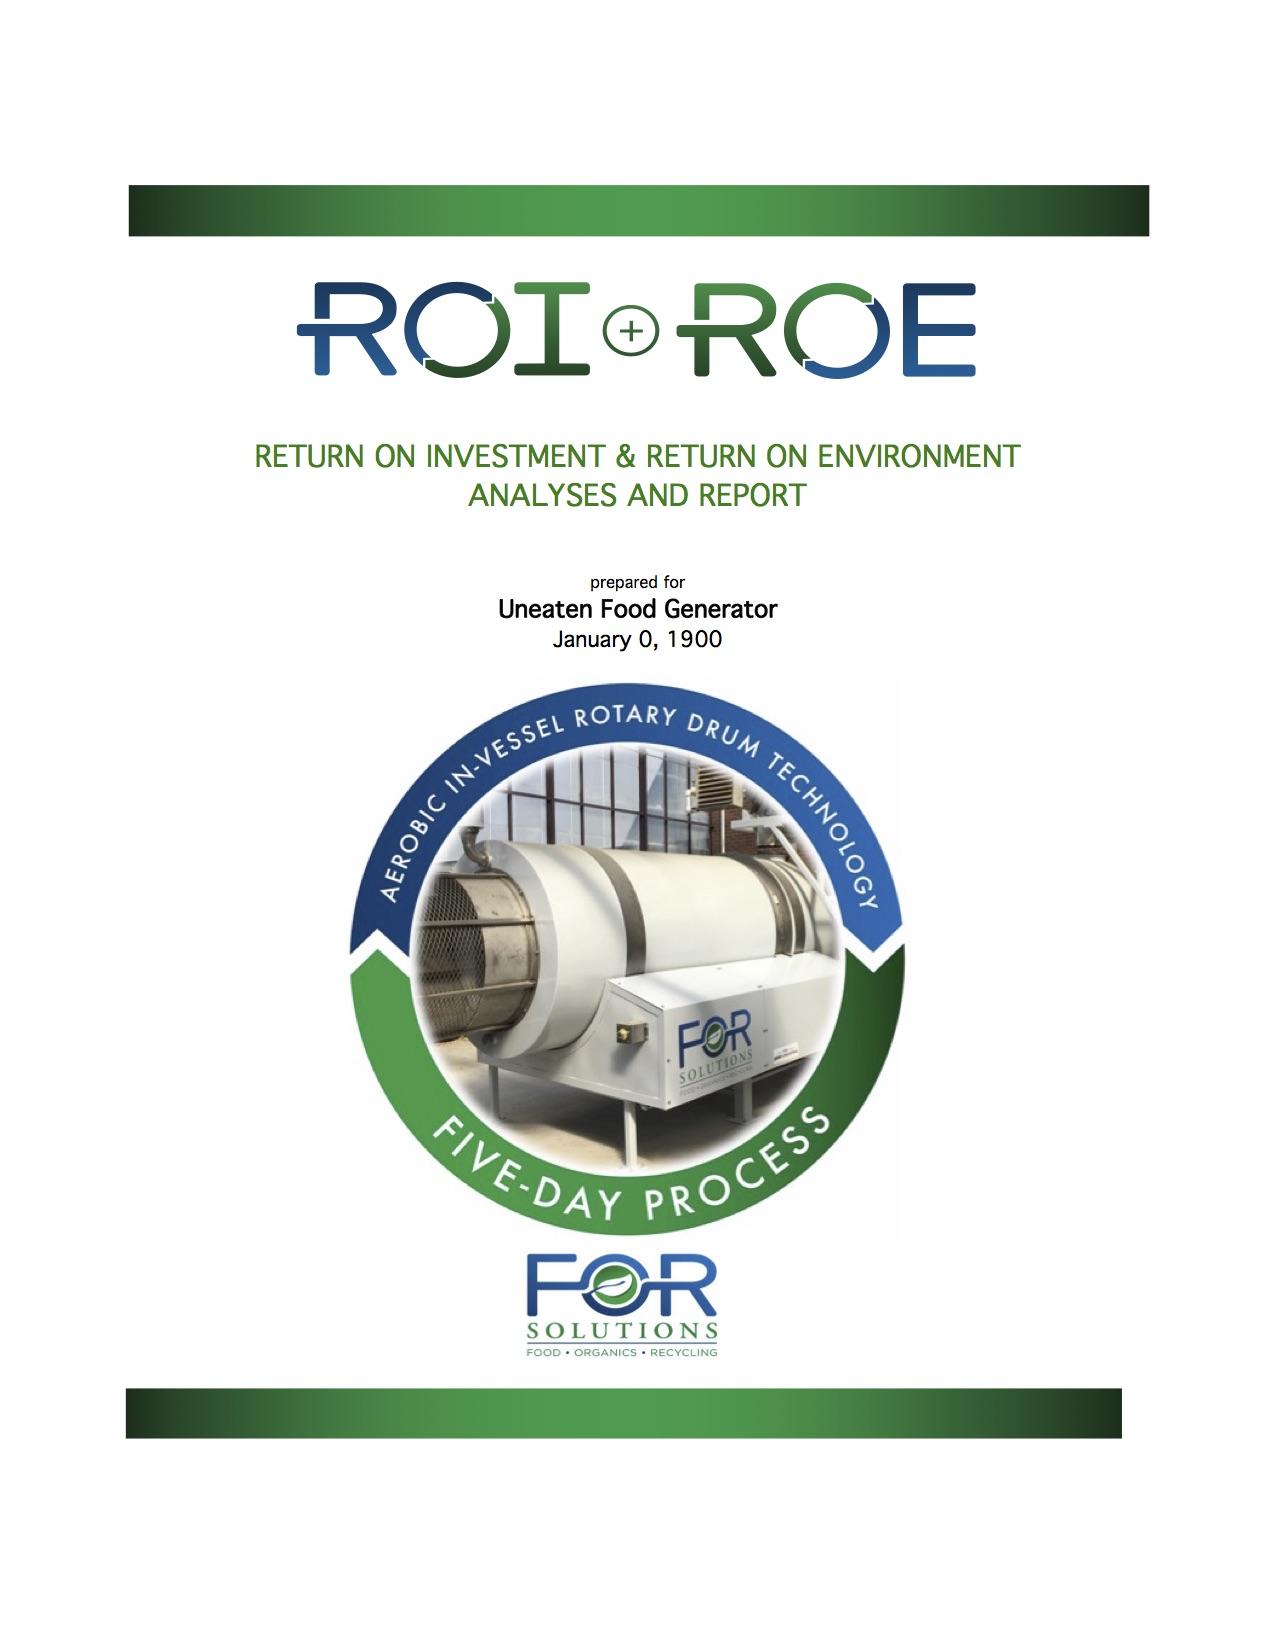 ROI-ROE COVER.jpg